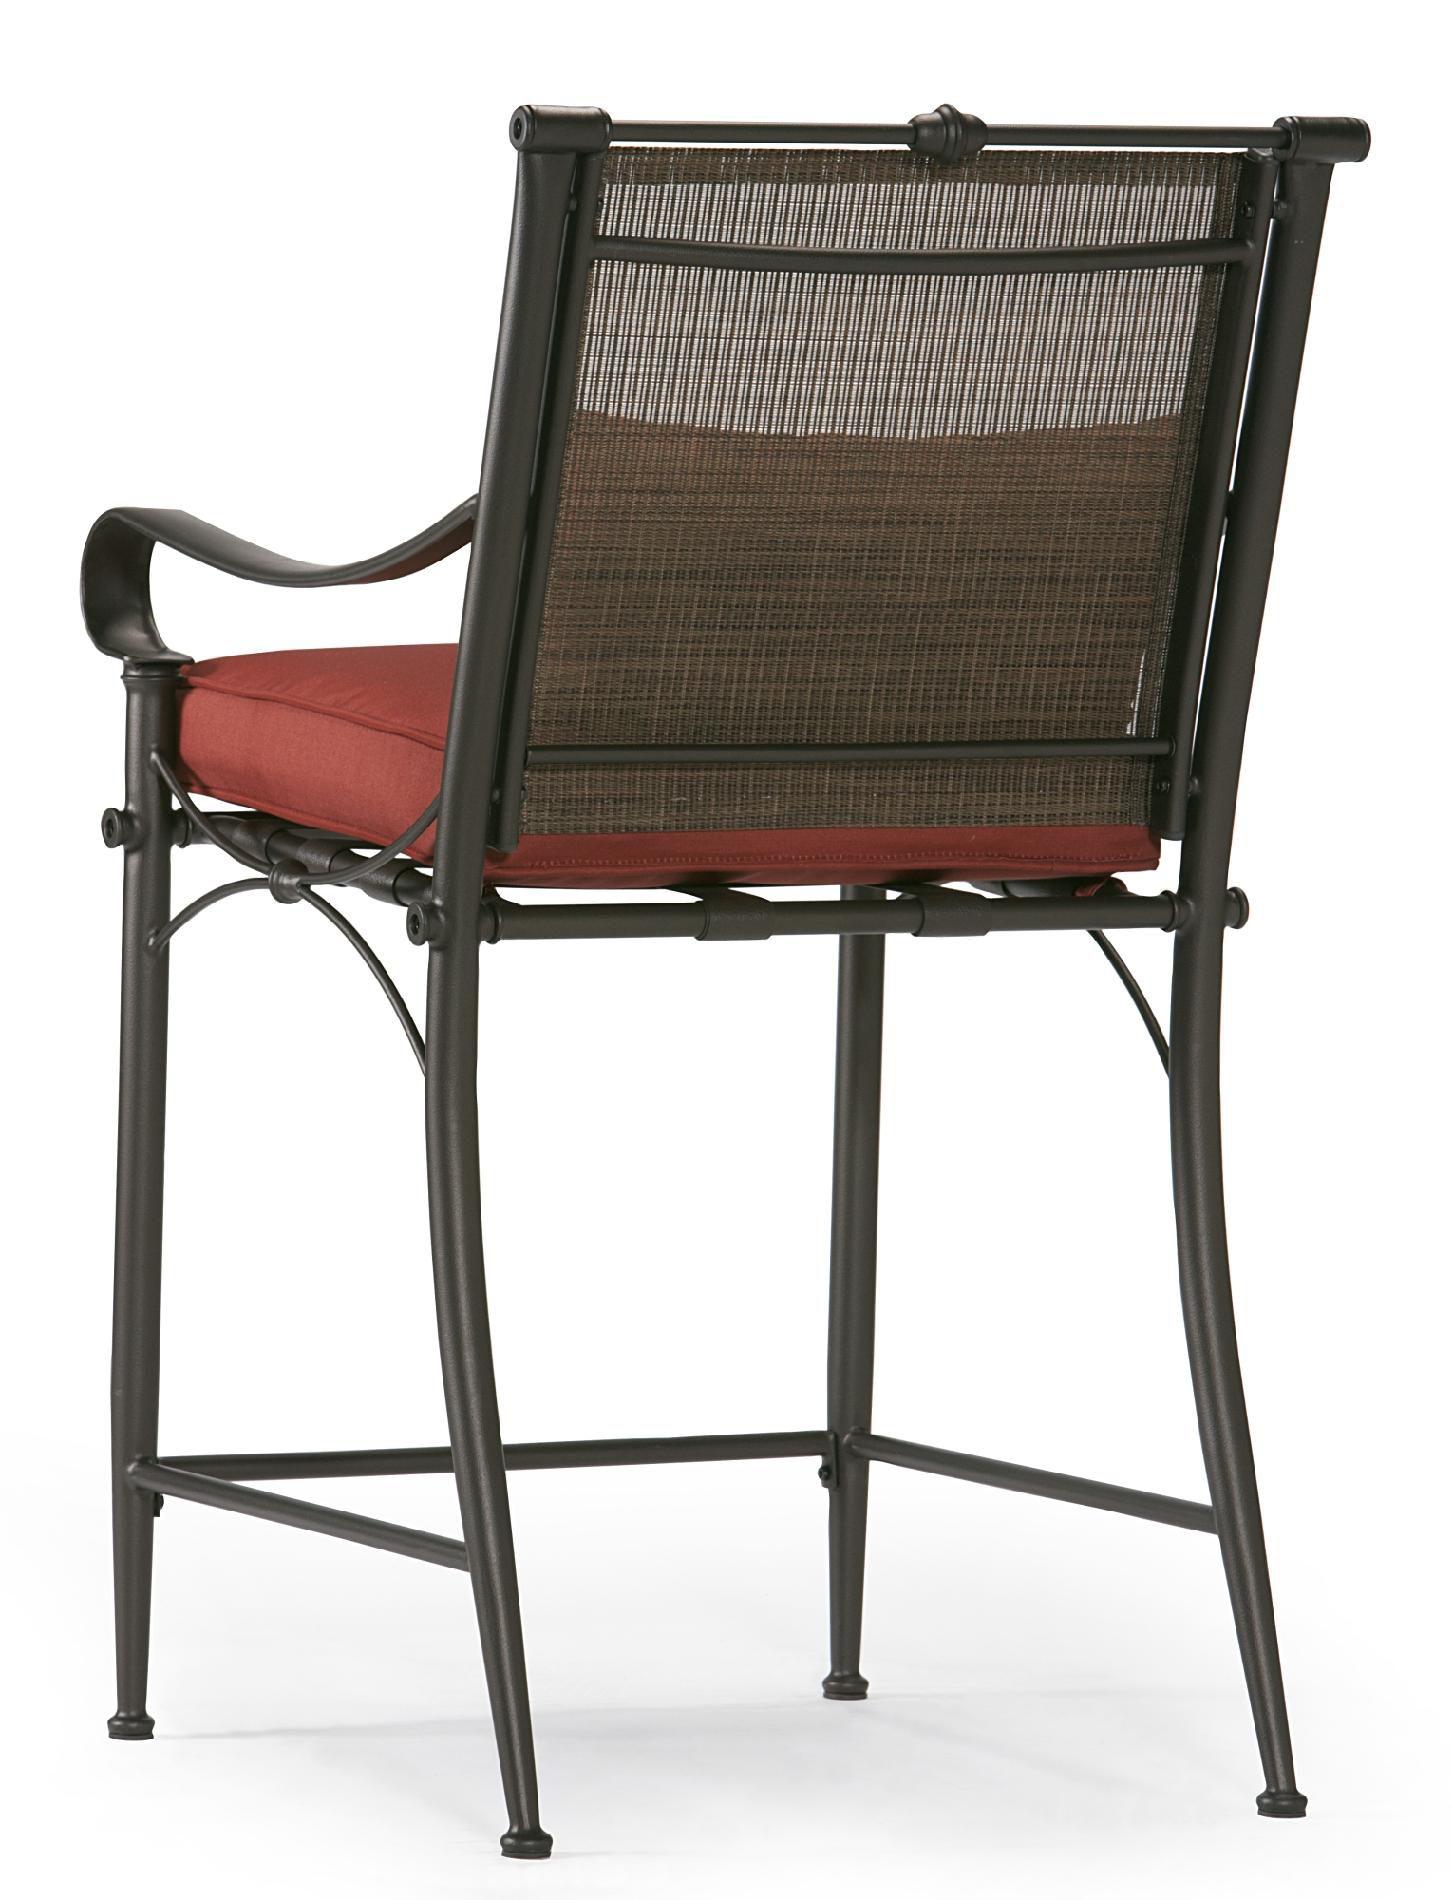 Garden Oasis Van Buren 5pc Cushion/Sling High Dining Set *Limited Availability